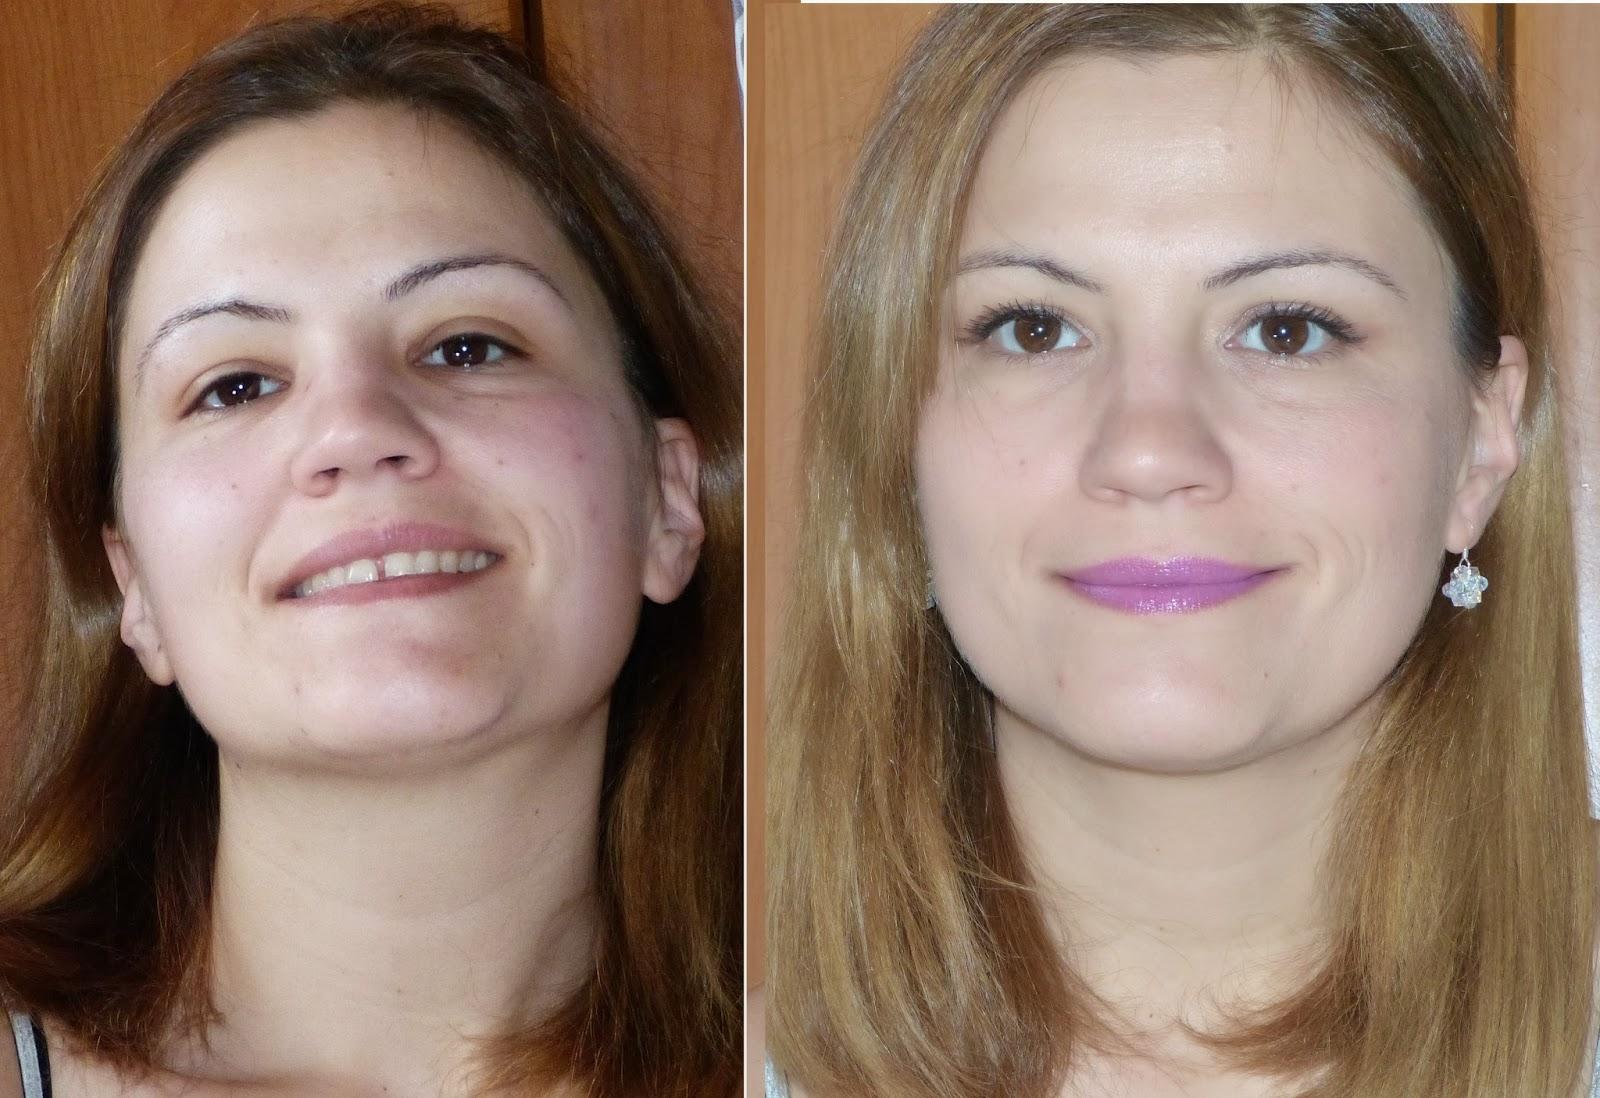 con/sin maquillaje